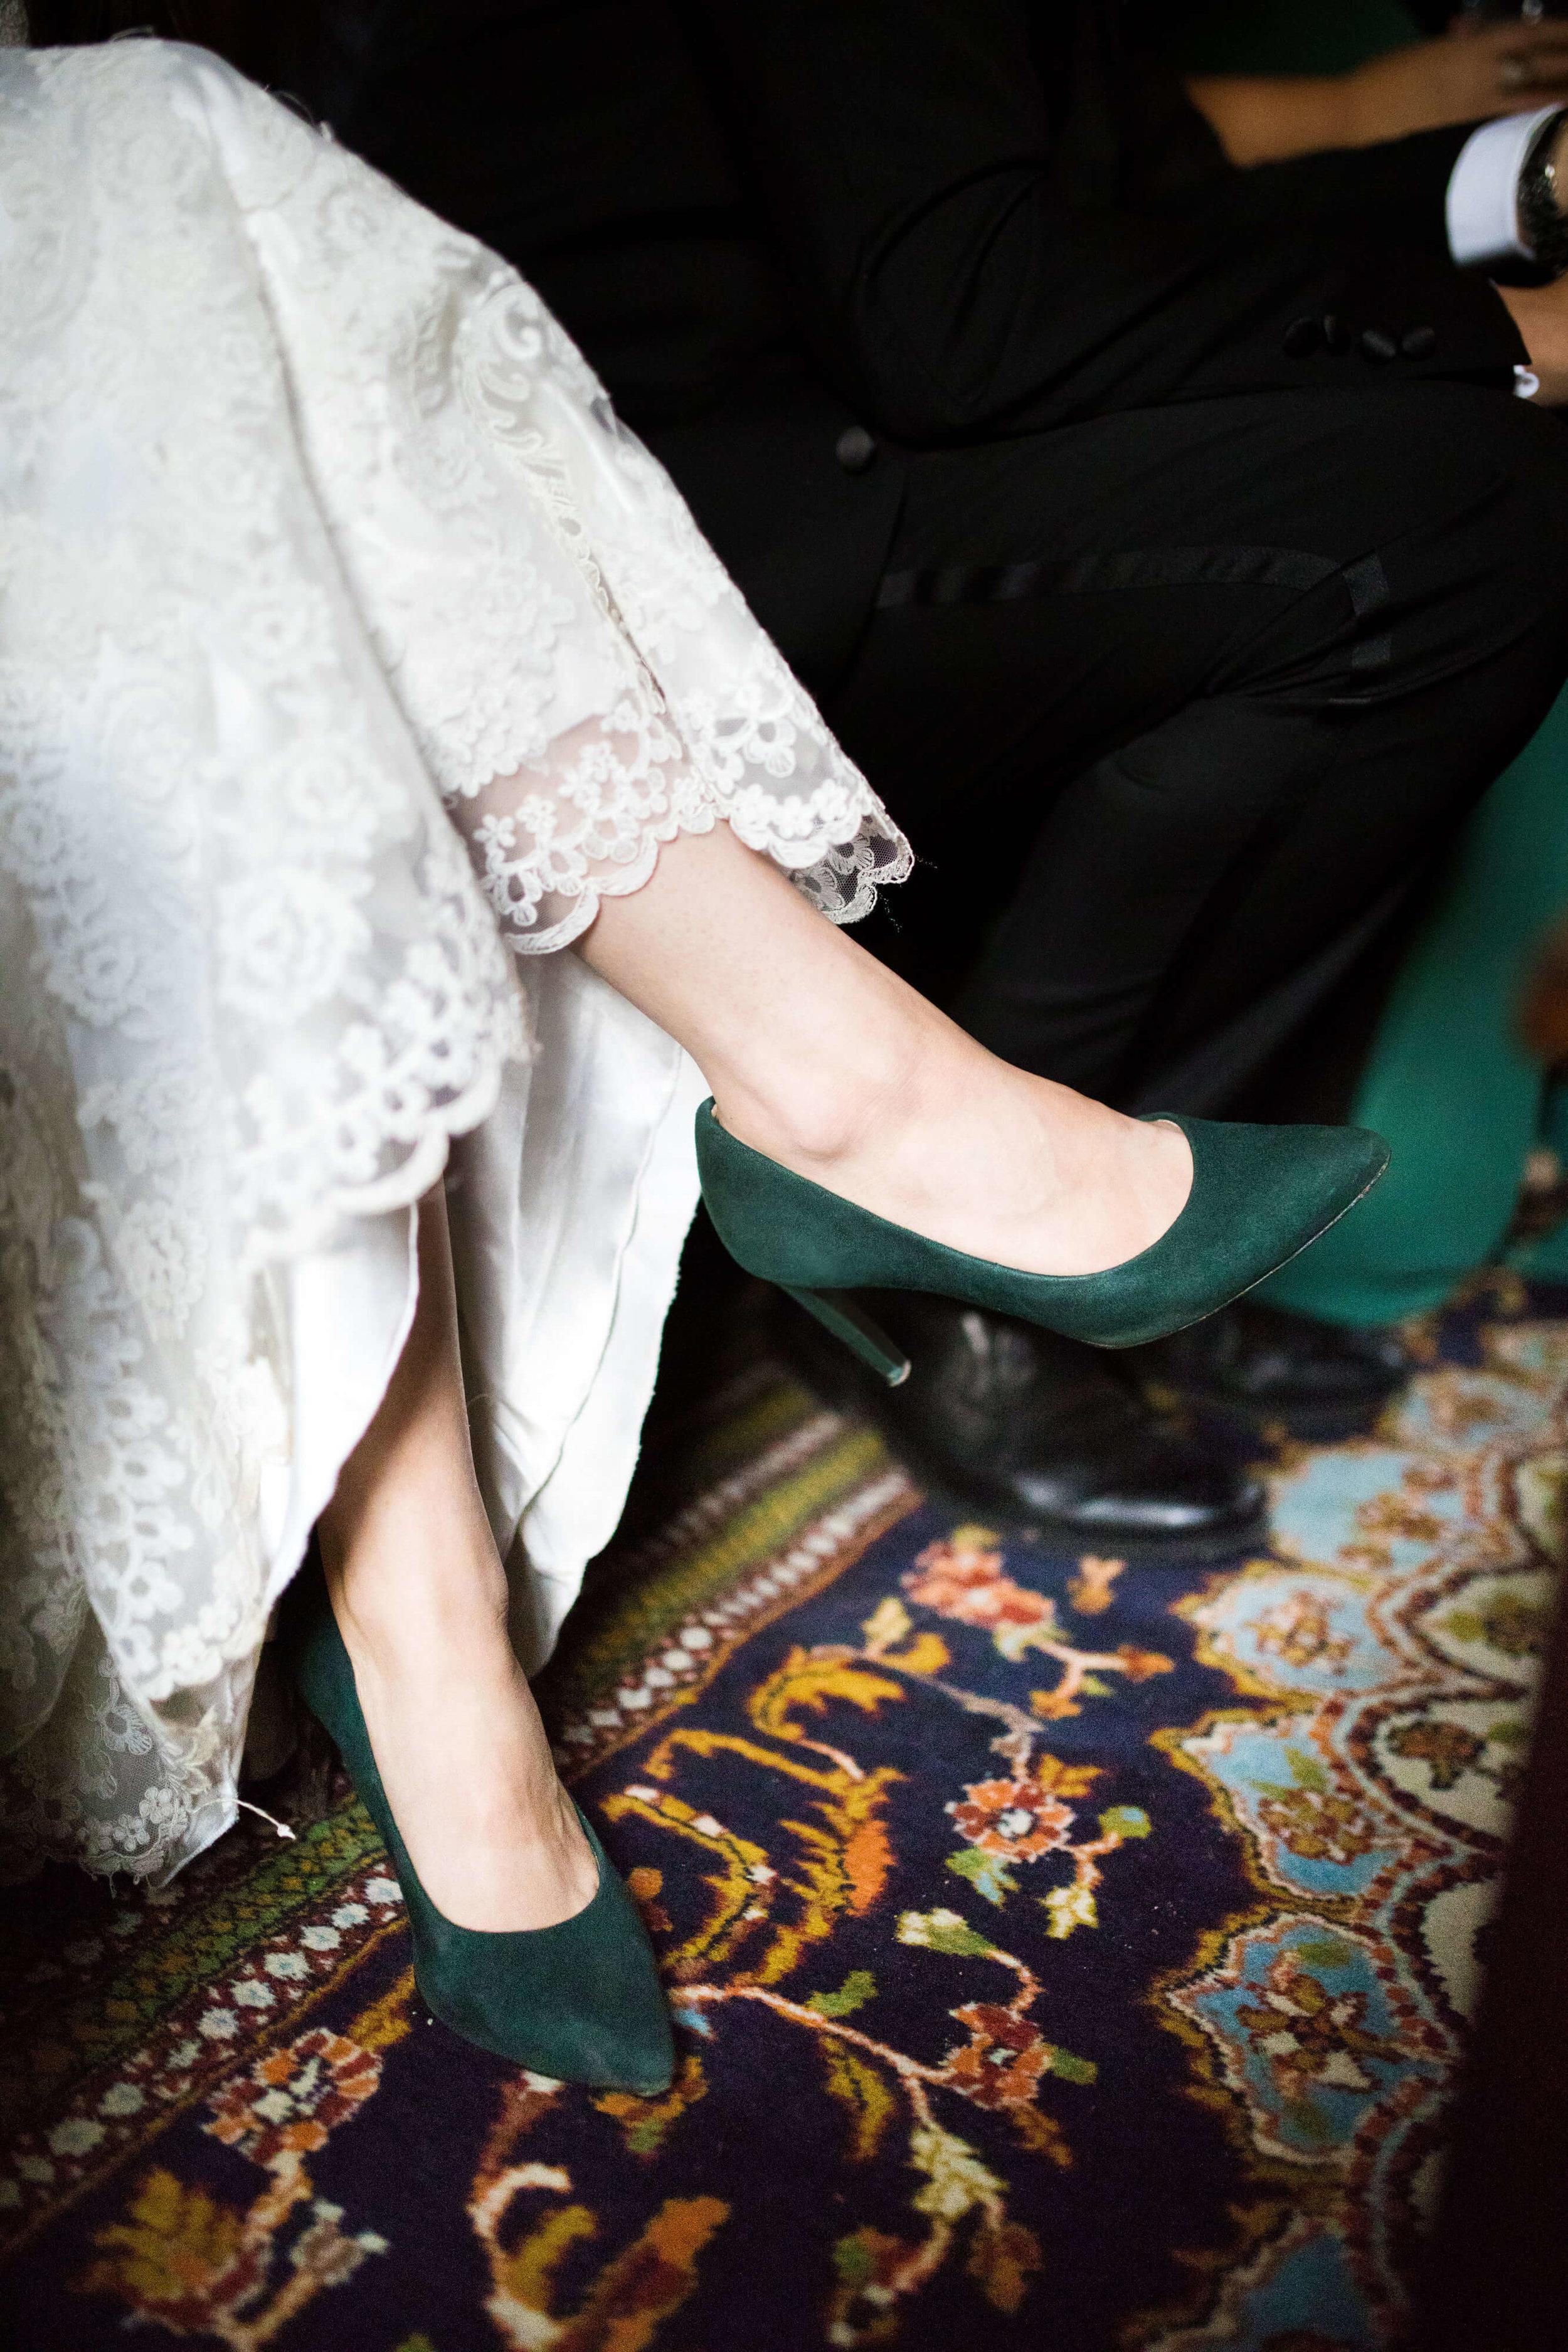 Studio KH wedding photographer | Sixpence Events and Planning, free wedding blog, free wedding help, free wedding advice | green velvet bridal heels